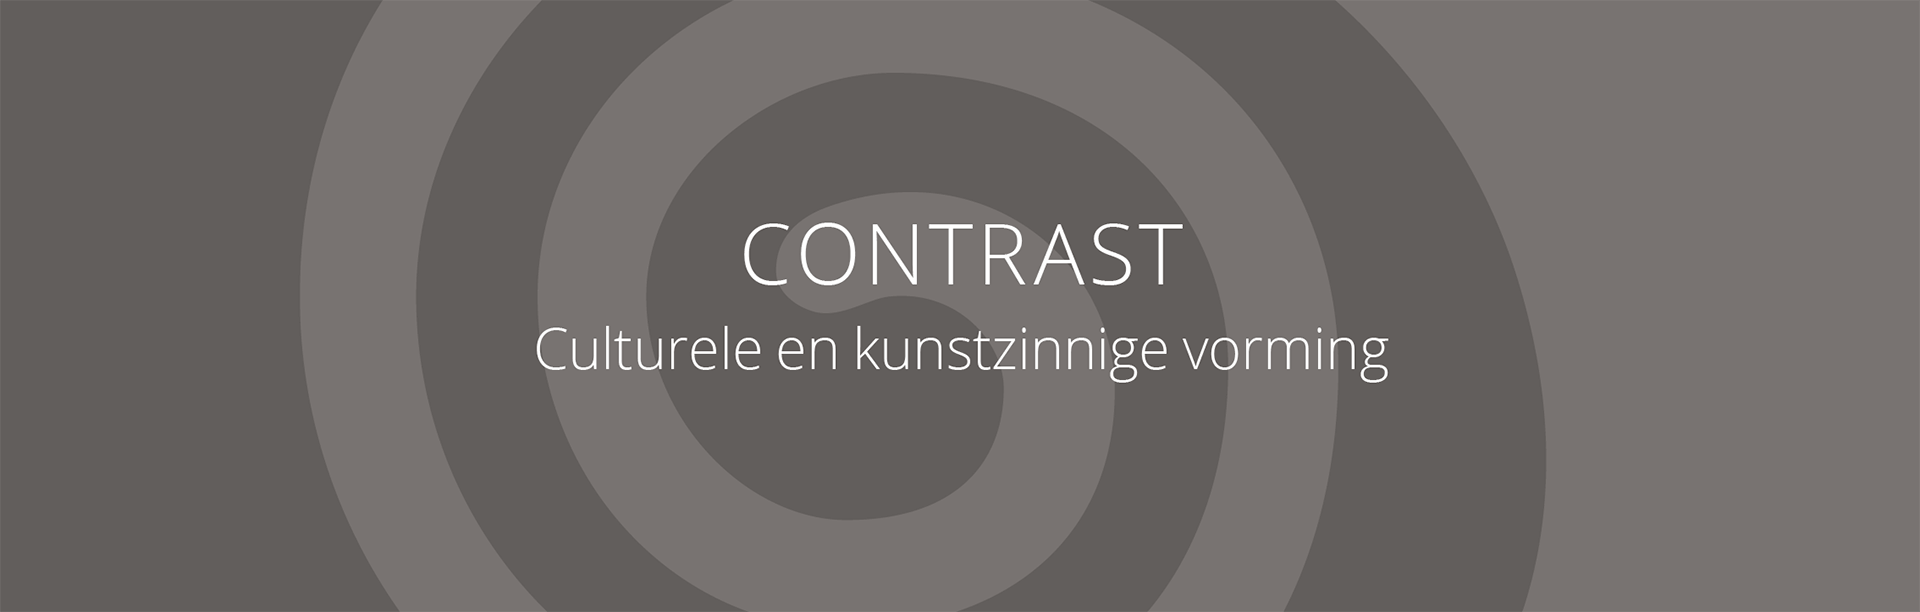 CONTRAST CKV kunst lesmethode Staal & Roeland